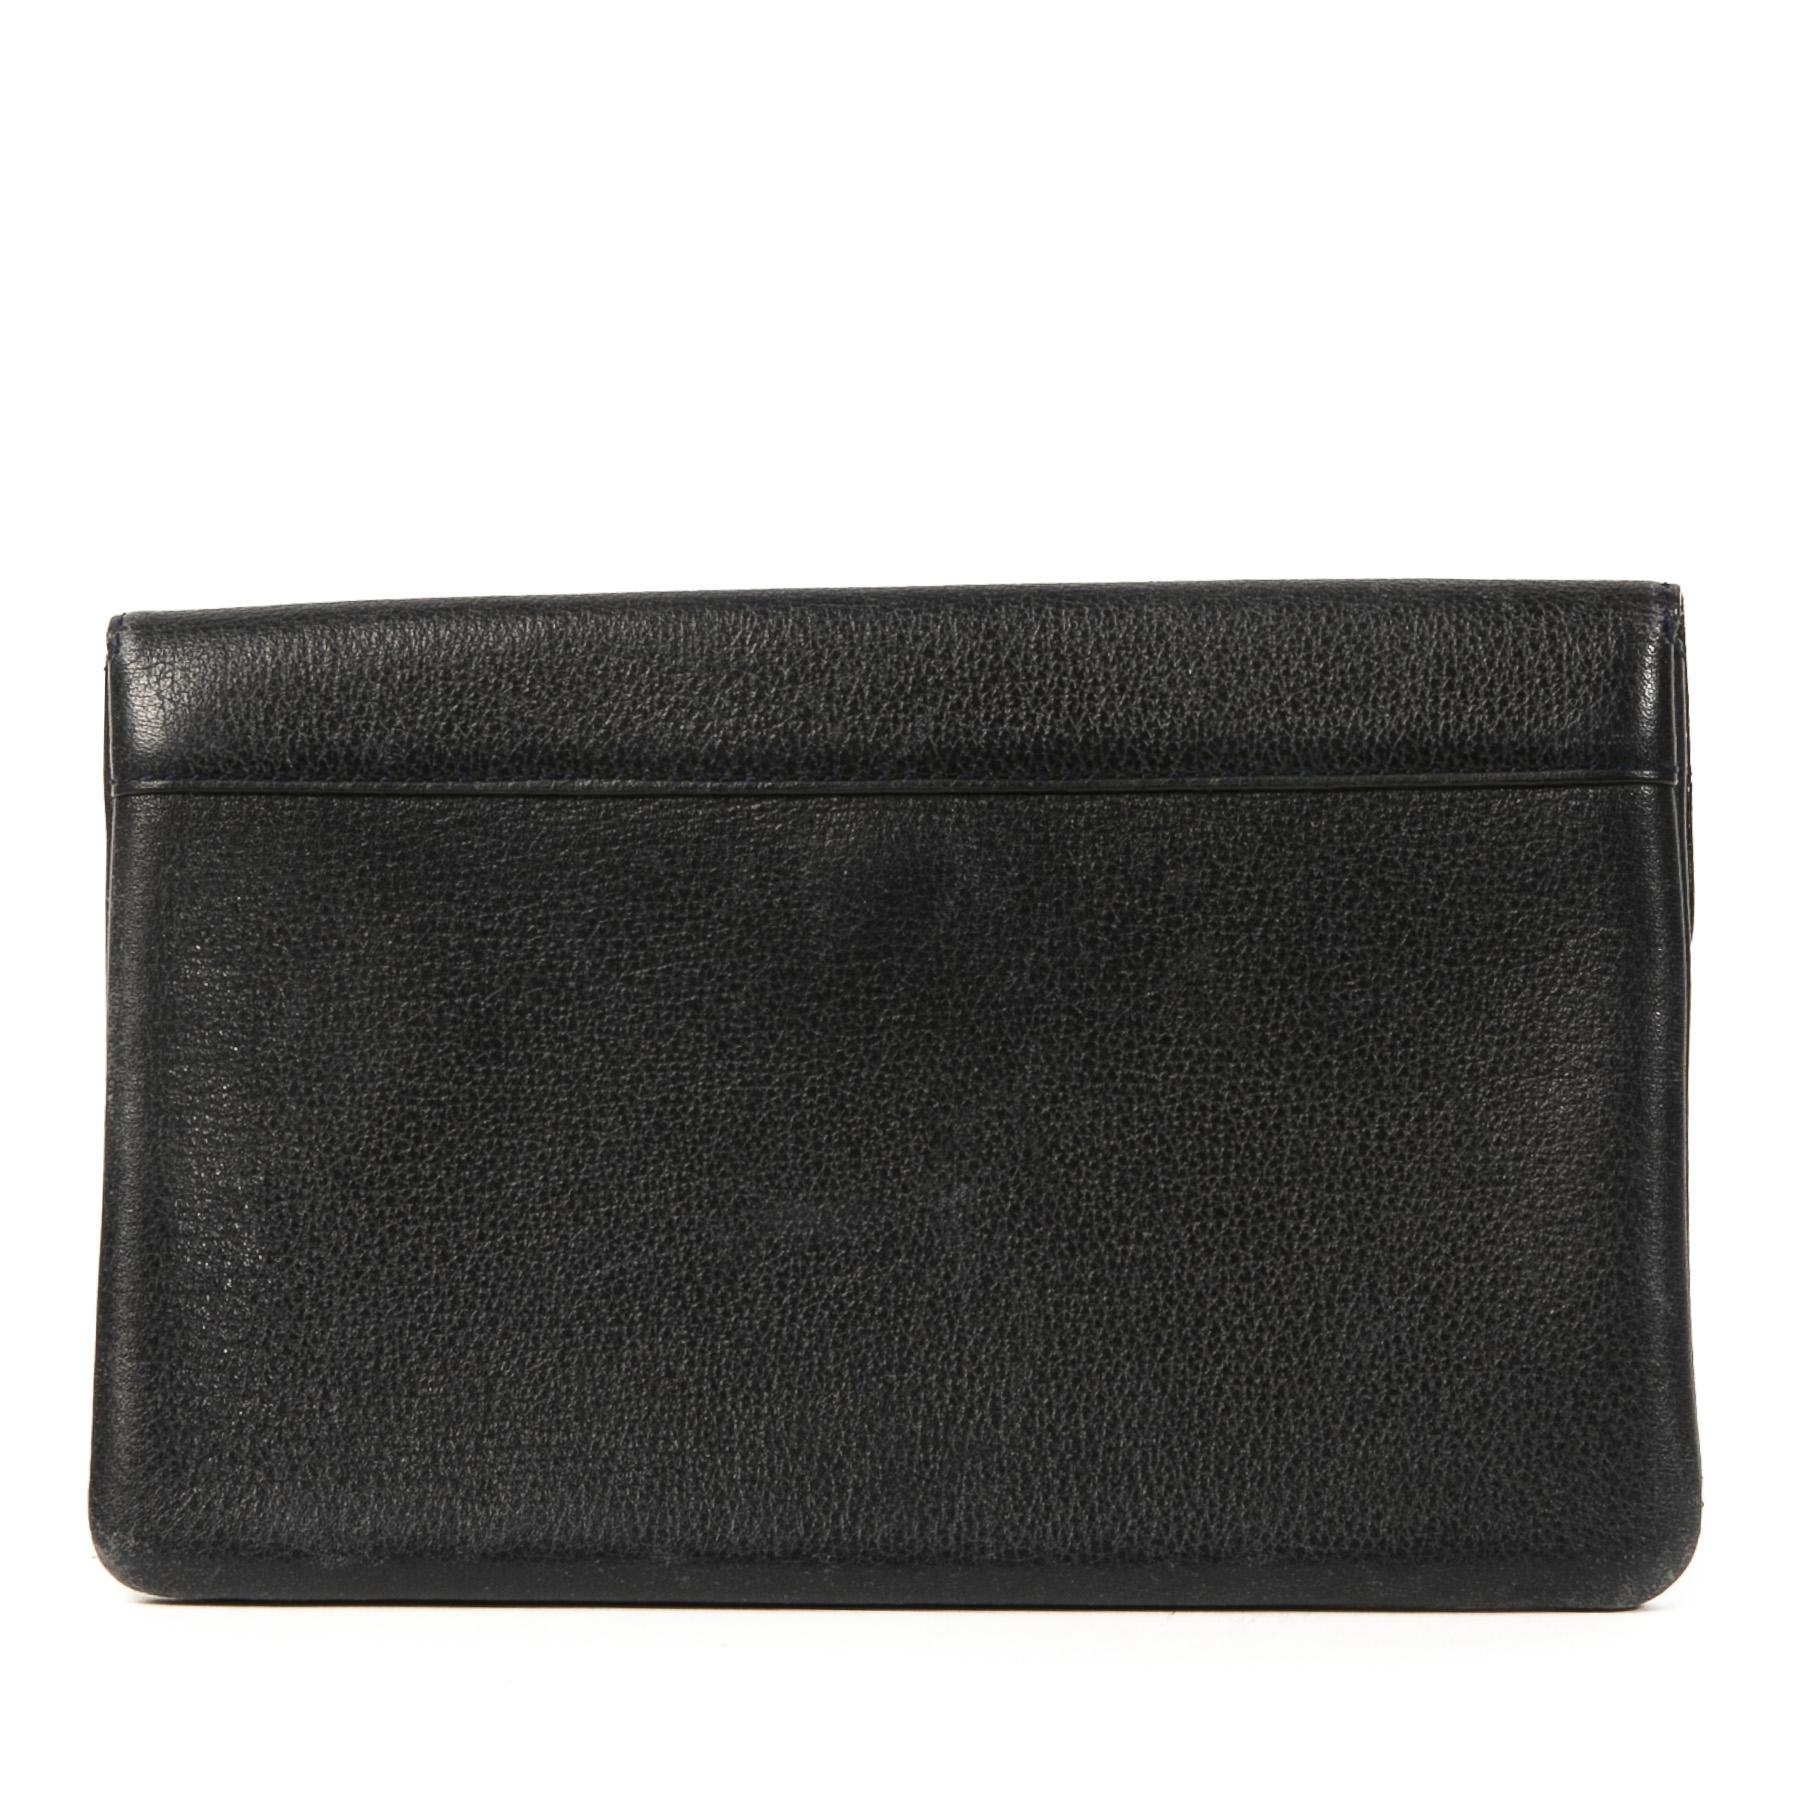 Authentieke tweedehands vintage Delvaux Blue D Wallet koop online webshop LabelLOV